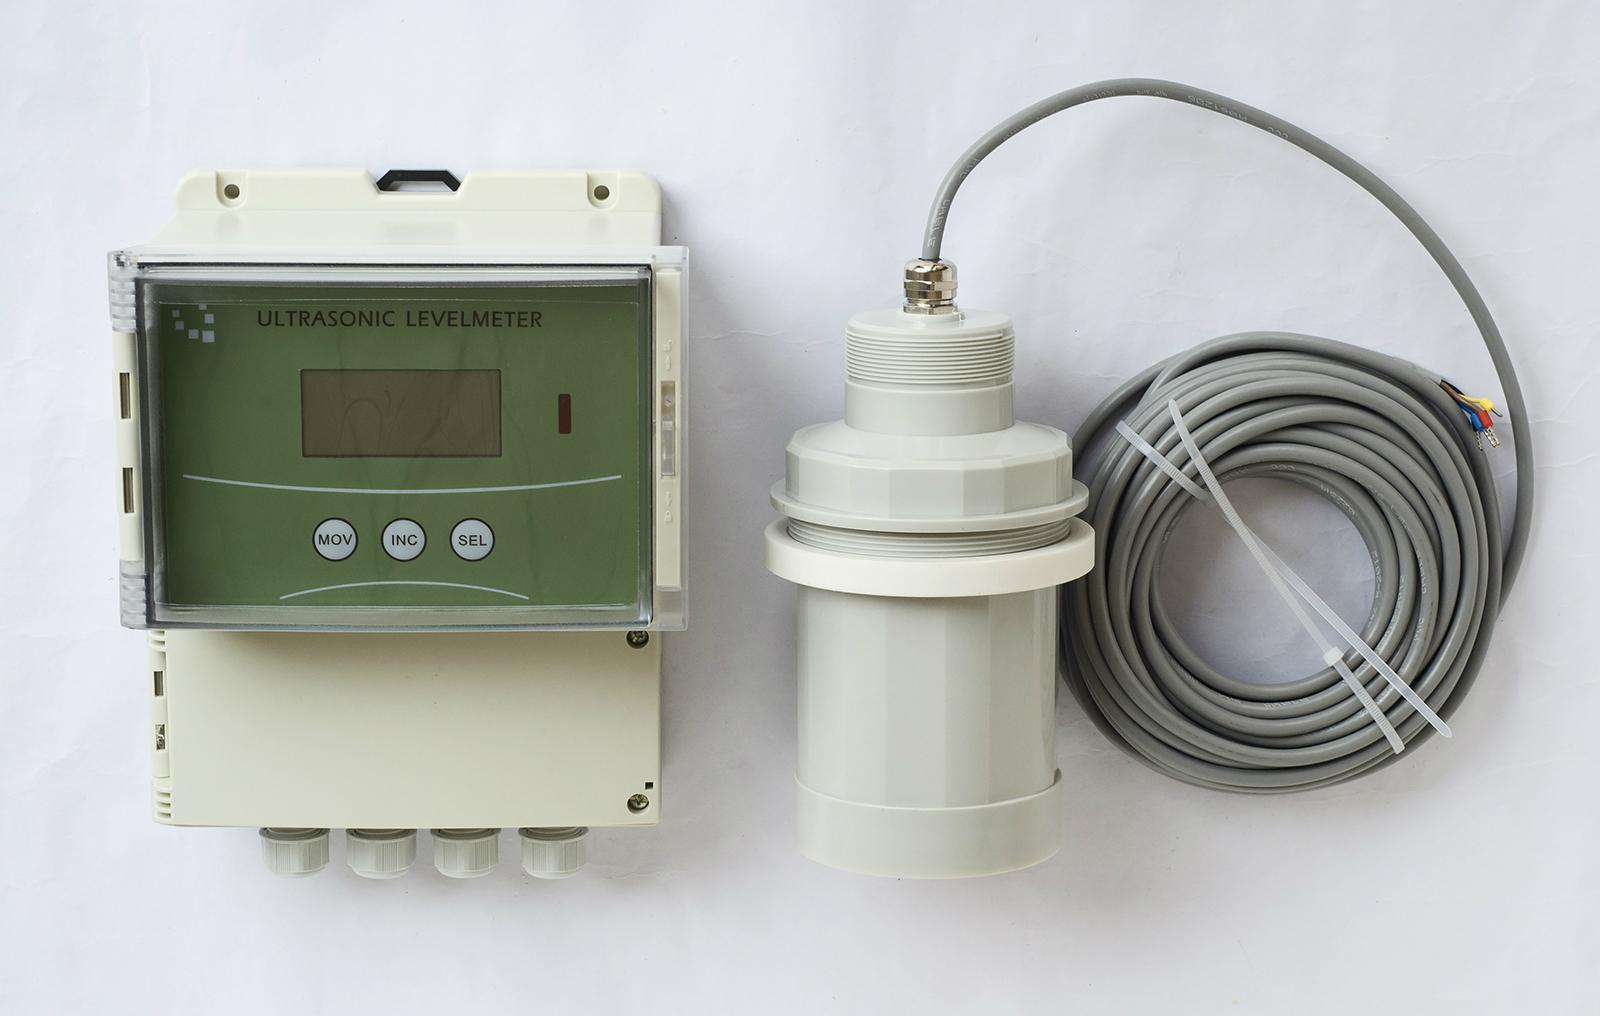 Remote type Ultrasonic levelmeter 1